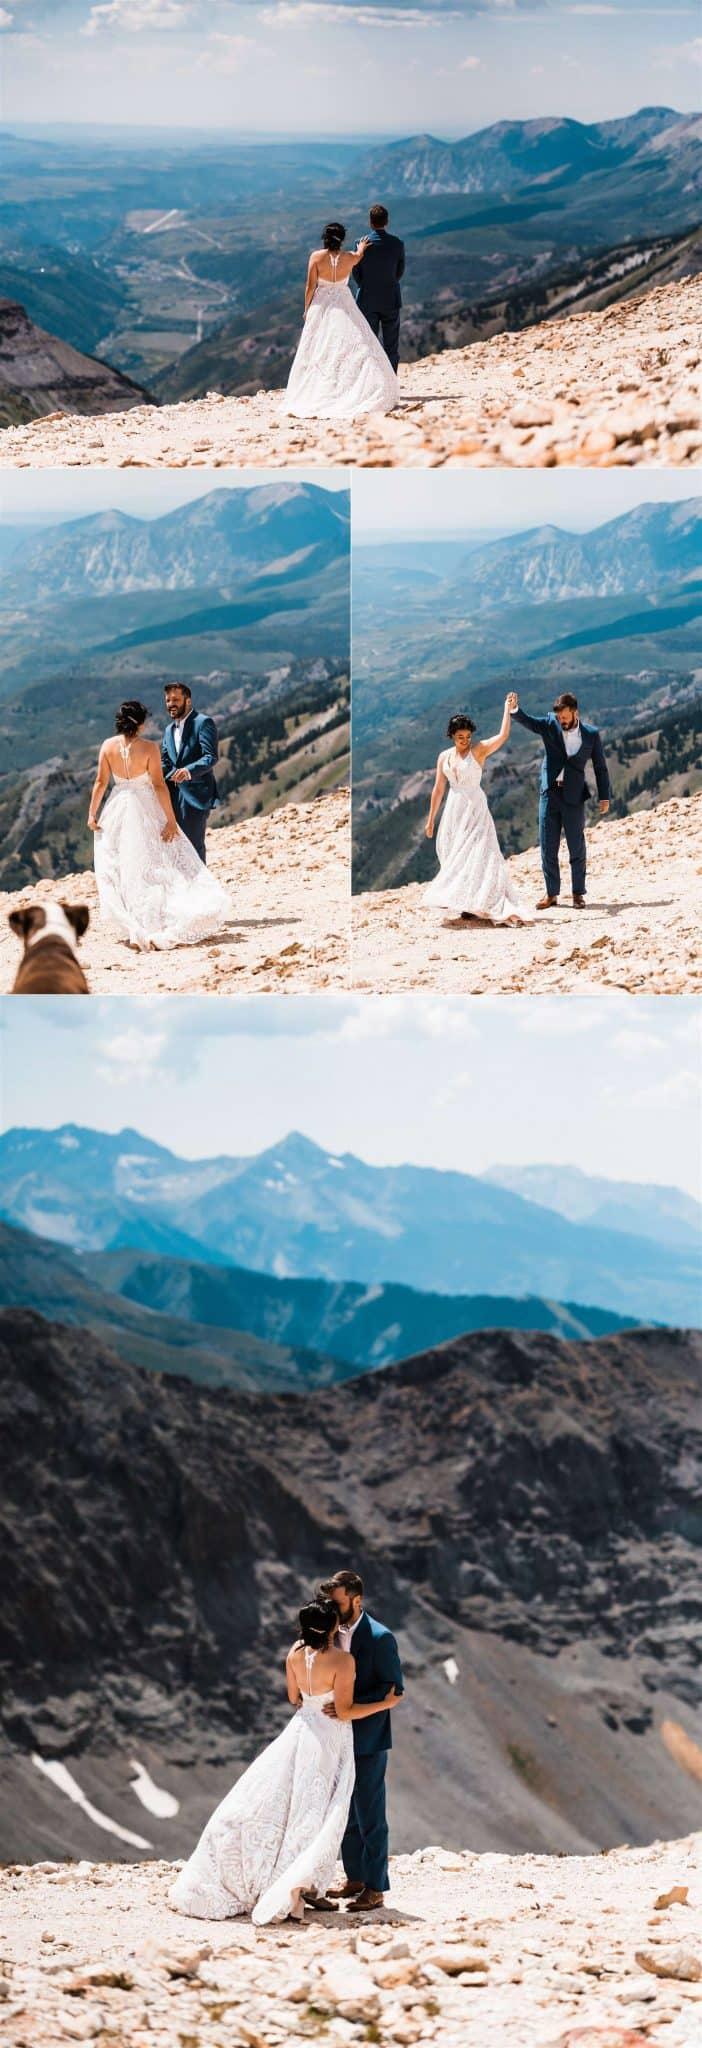 Colorado_Jeeping_Elopement_Emily_Matt_The_Foxes_Photography_0007.jpg